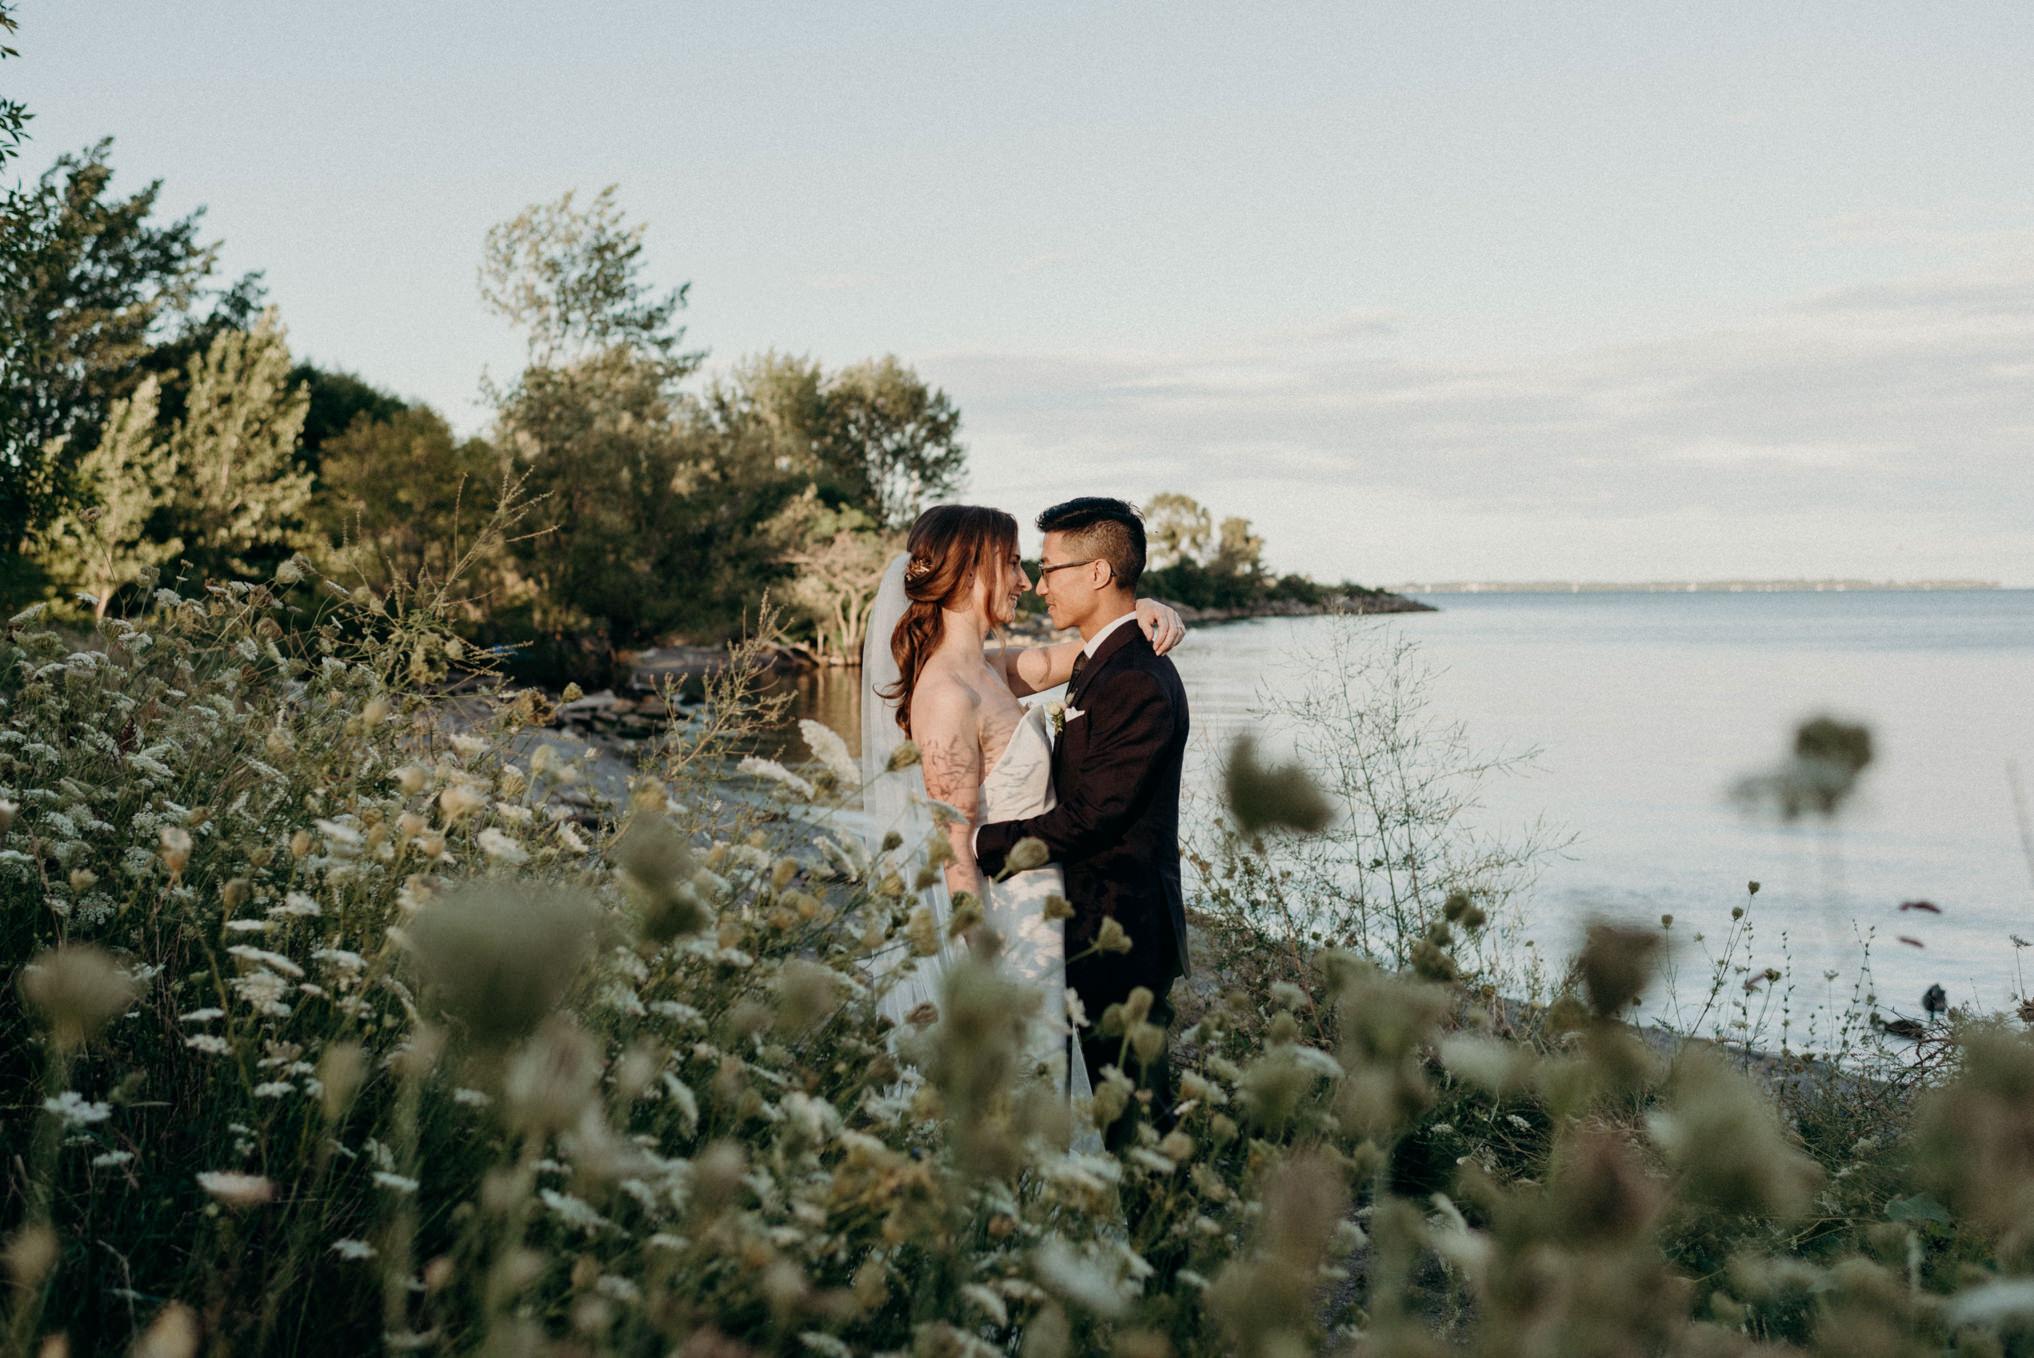 Humber Bay wedding portraits at sunset